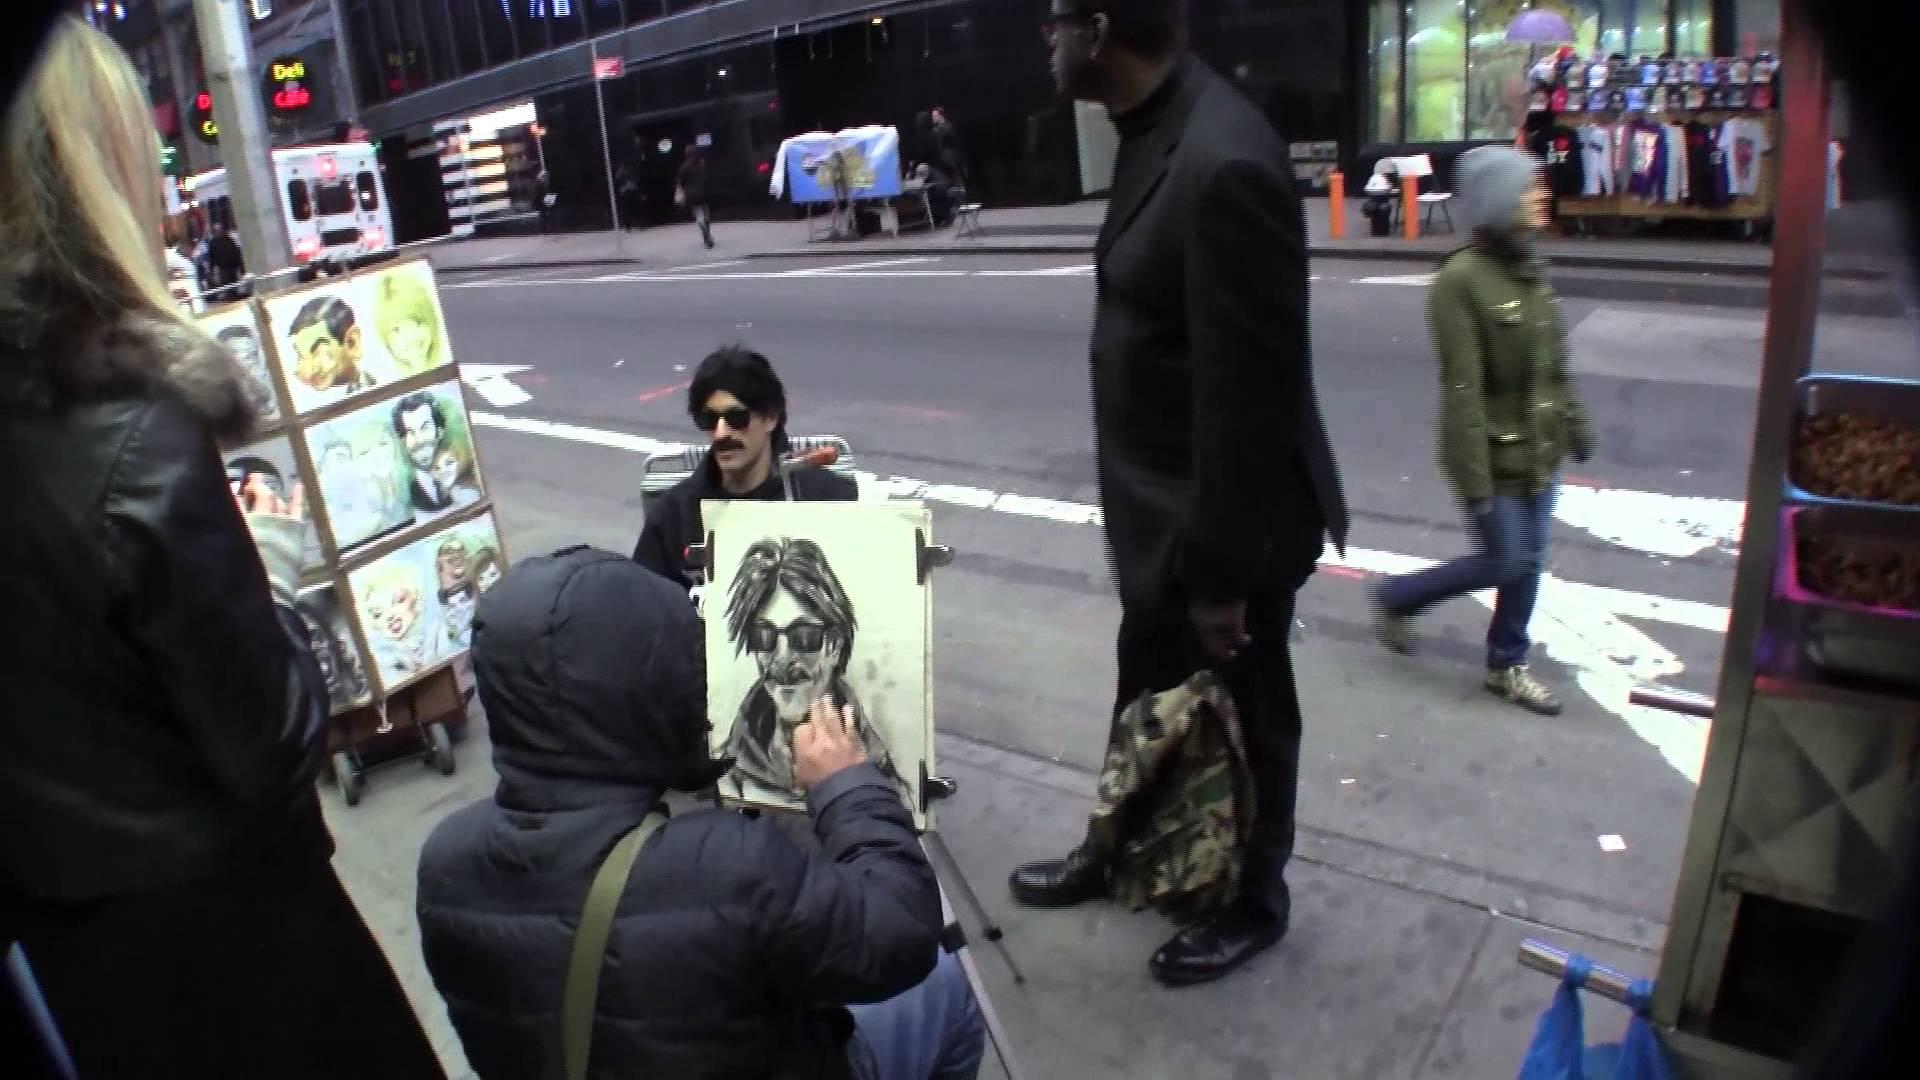 Drawn portrait street YouTube drawn Banksy Square NYC